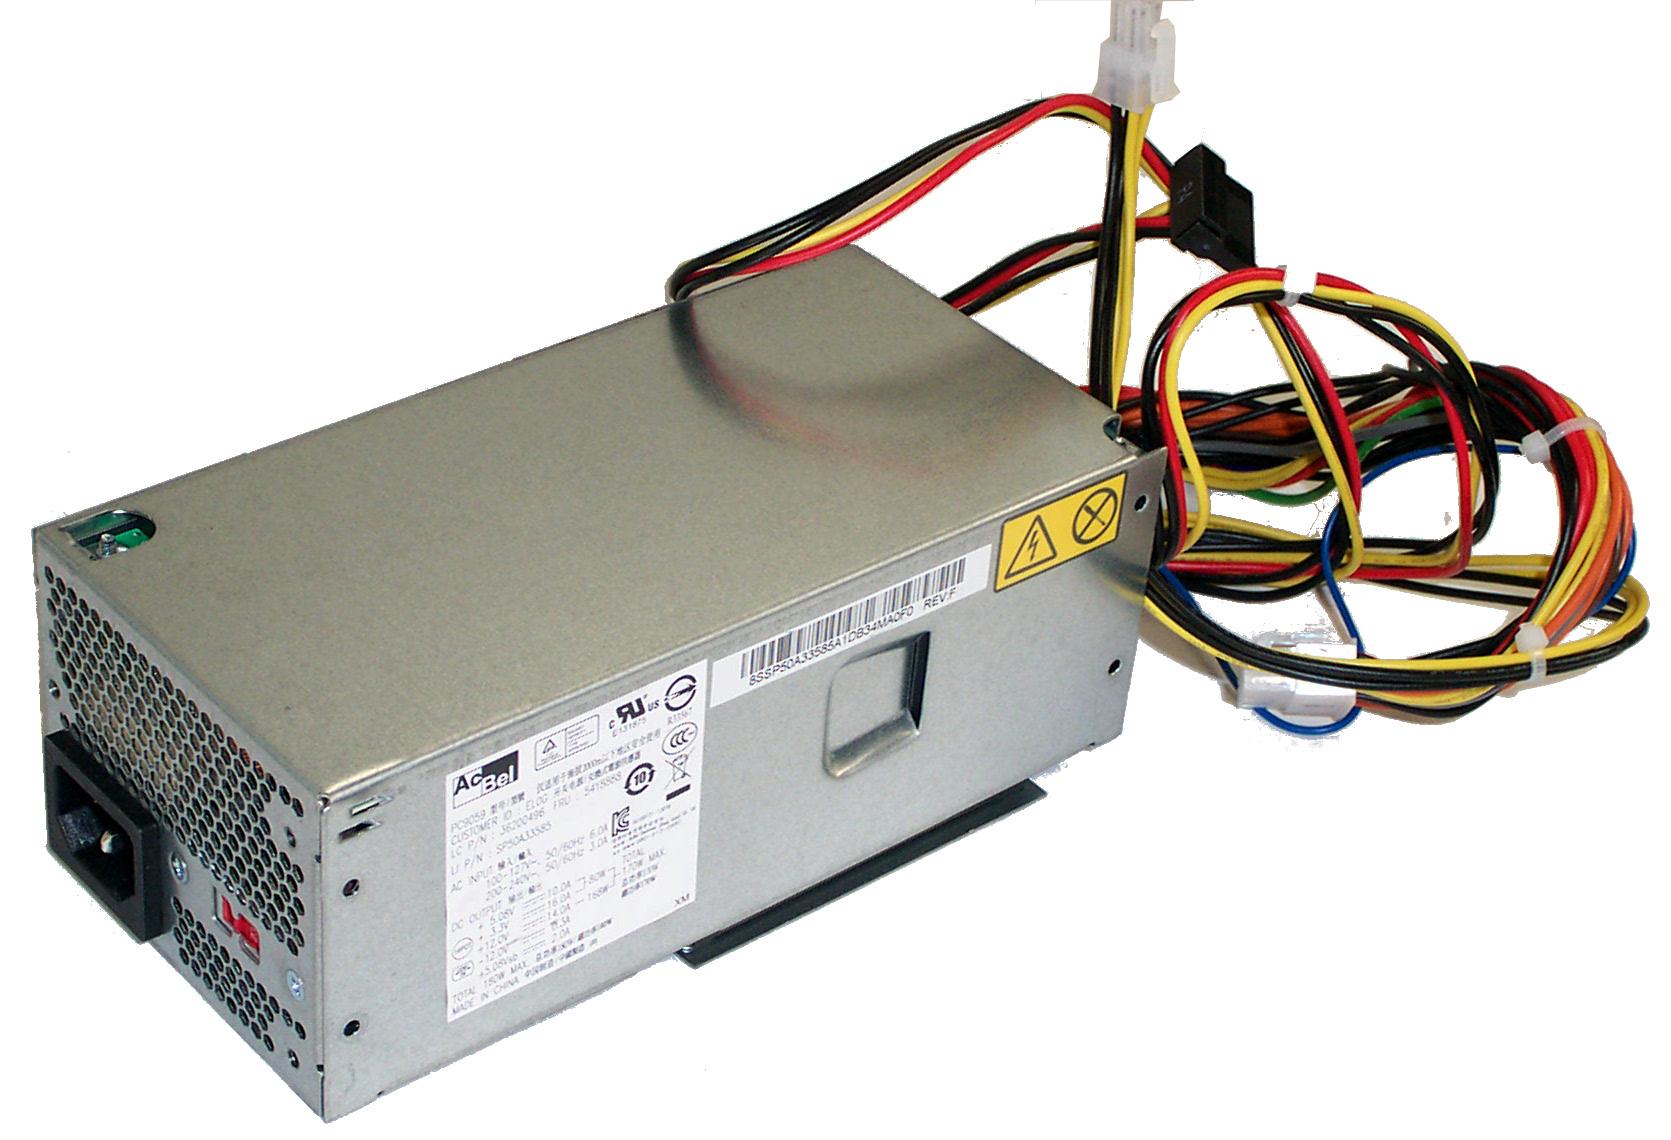 Lenovo 54Y8888 PC9059 180W 24-Pin Power Supply For ThinCentre A70 E73 Desktop PC